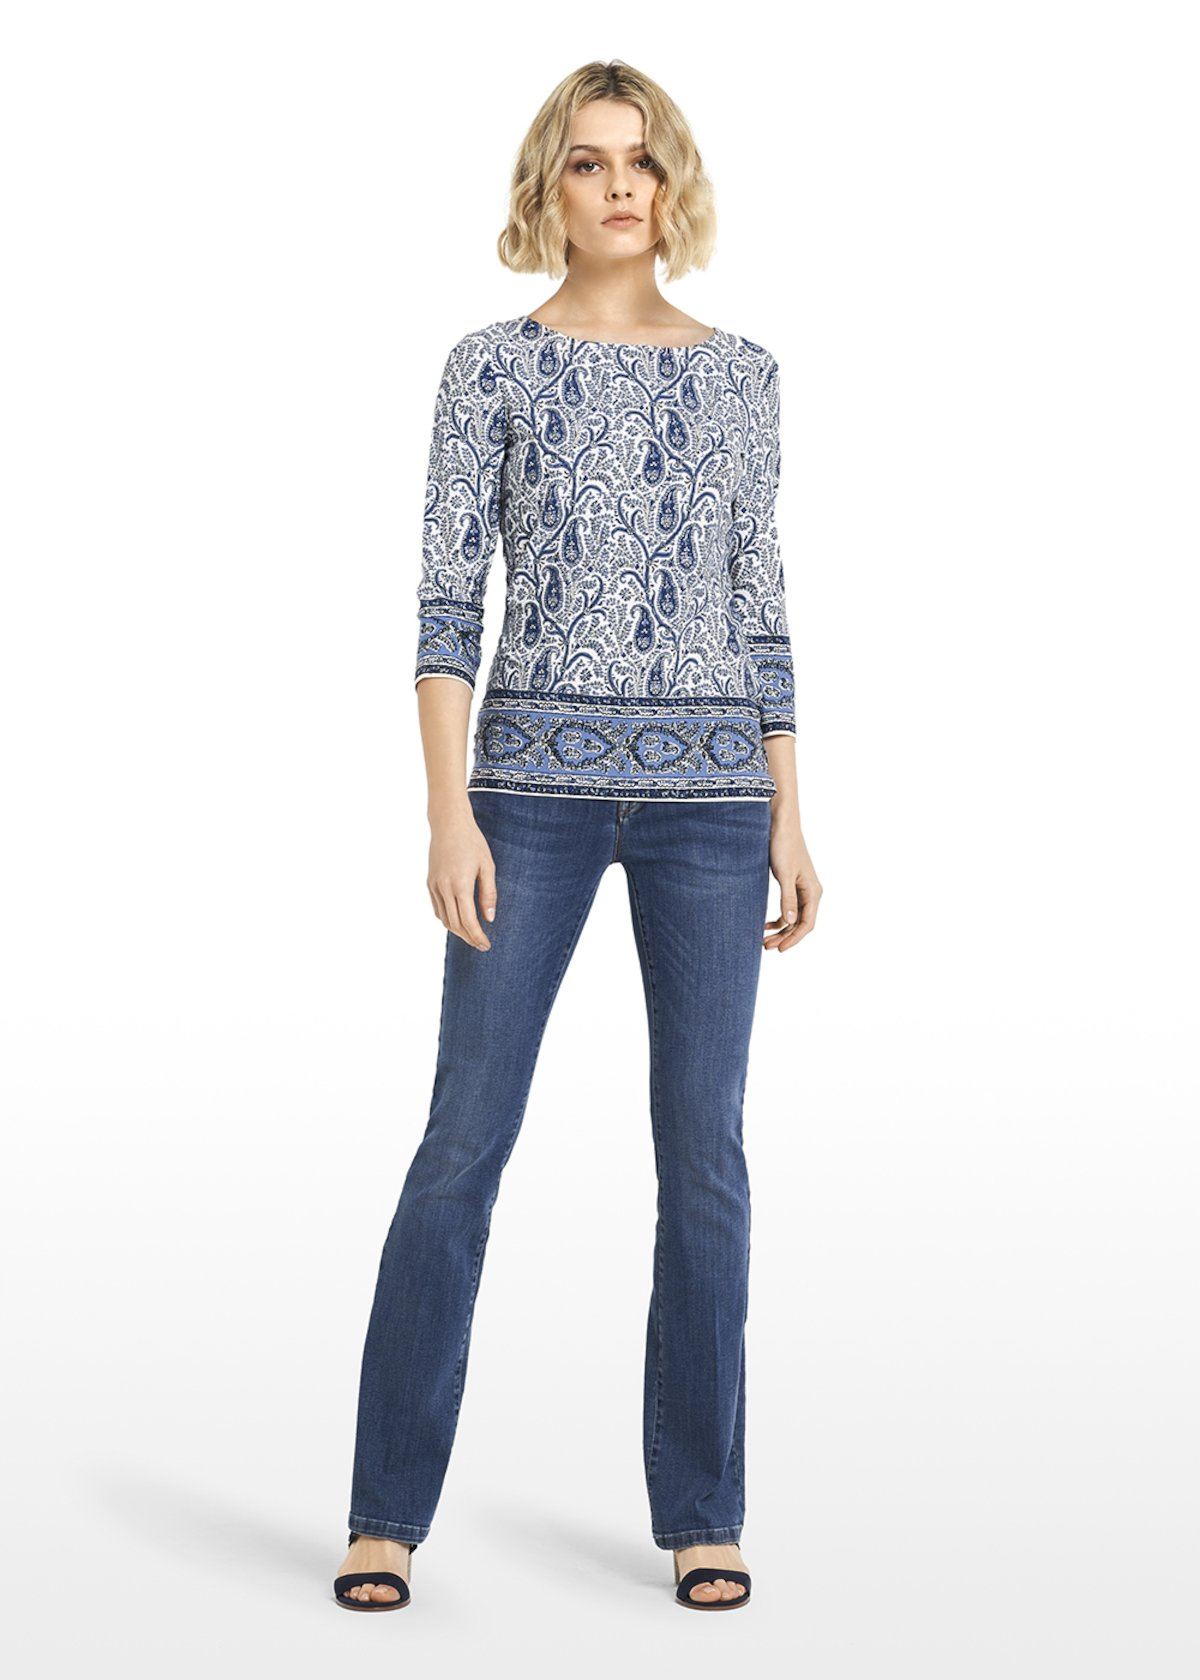 Paisley pattern jersey Safir t-shirt - White / Blue Fantasia - Woman - Category image